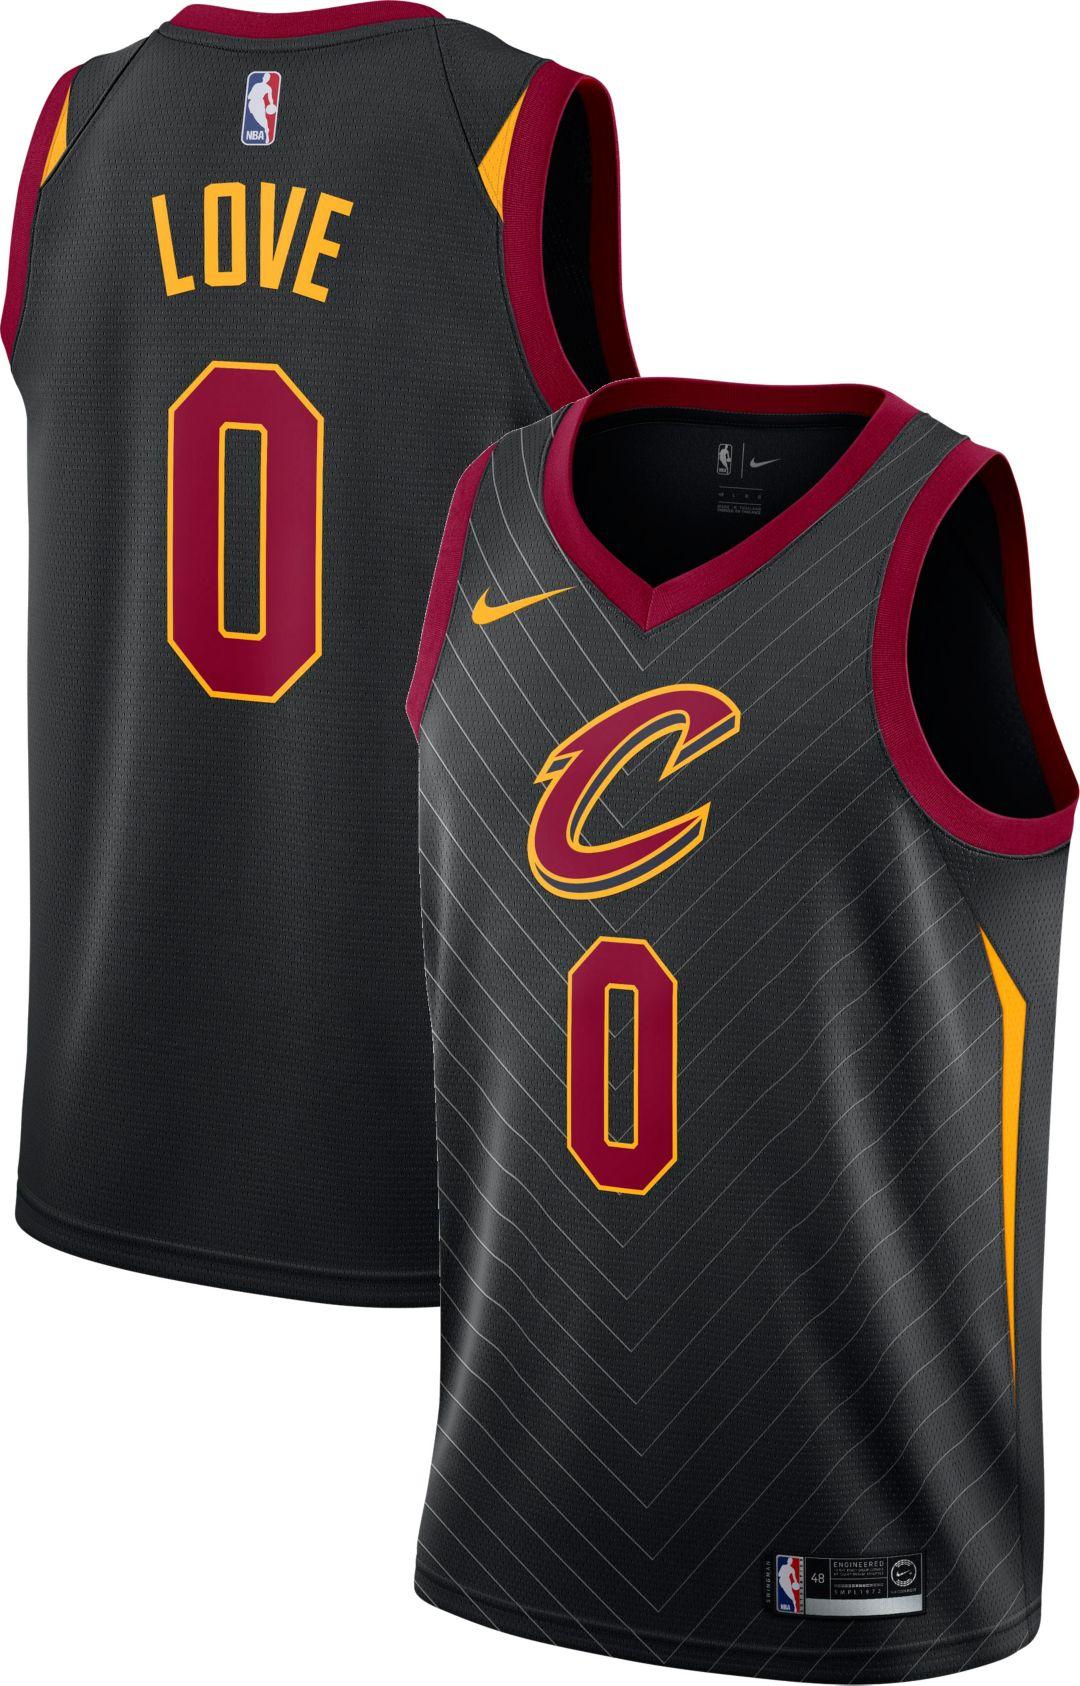 premium selection 36a88 c97c8 Nike Men's Cleveland Cavaliers Kevin Love #0 Black Dri-FIT Swingman Jersey